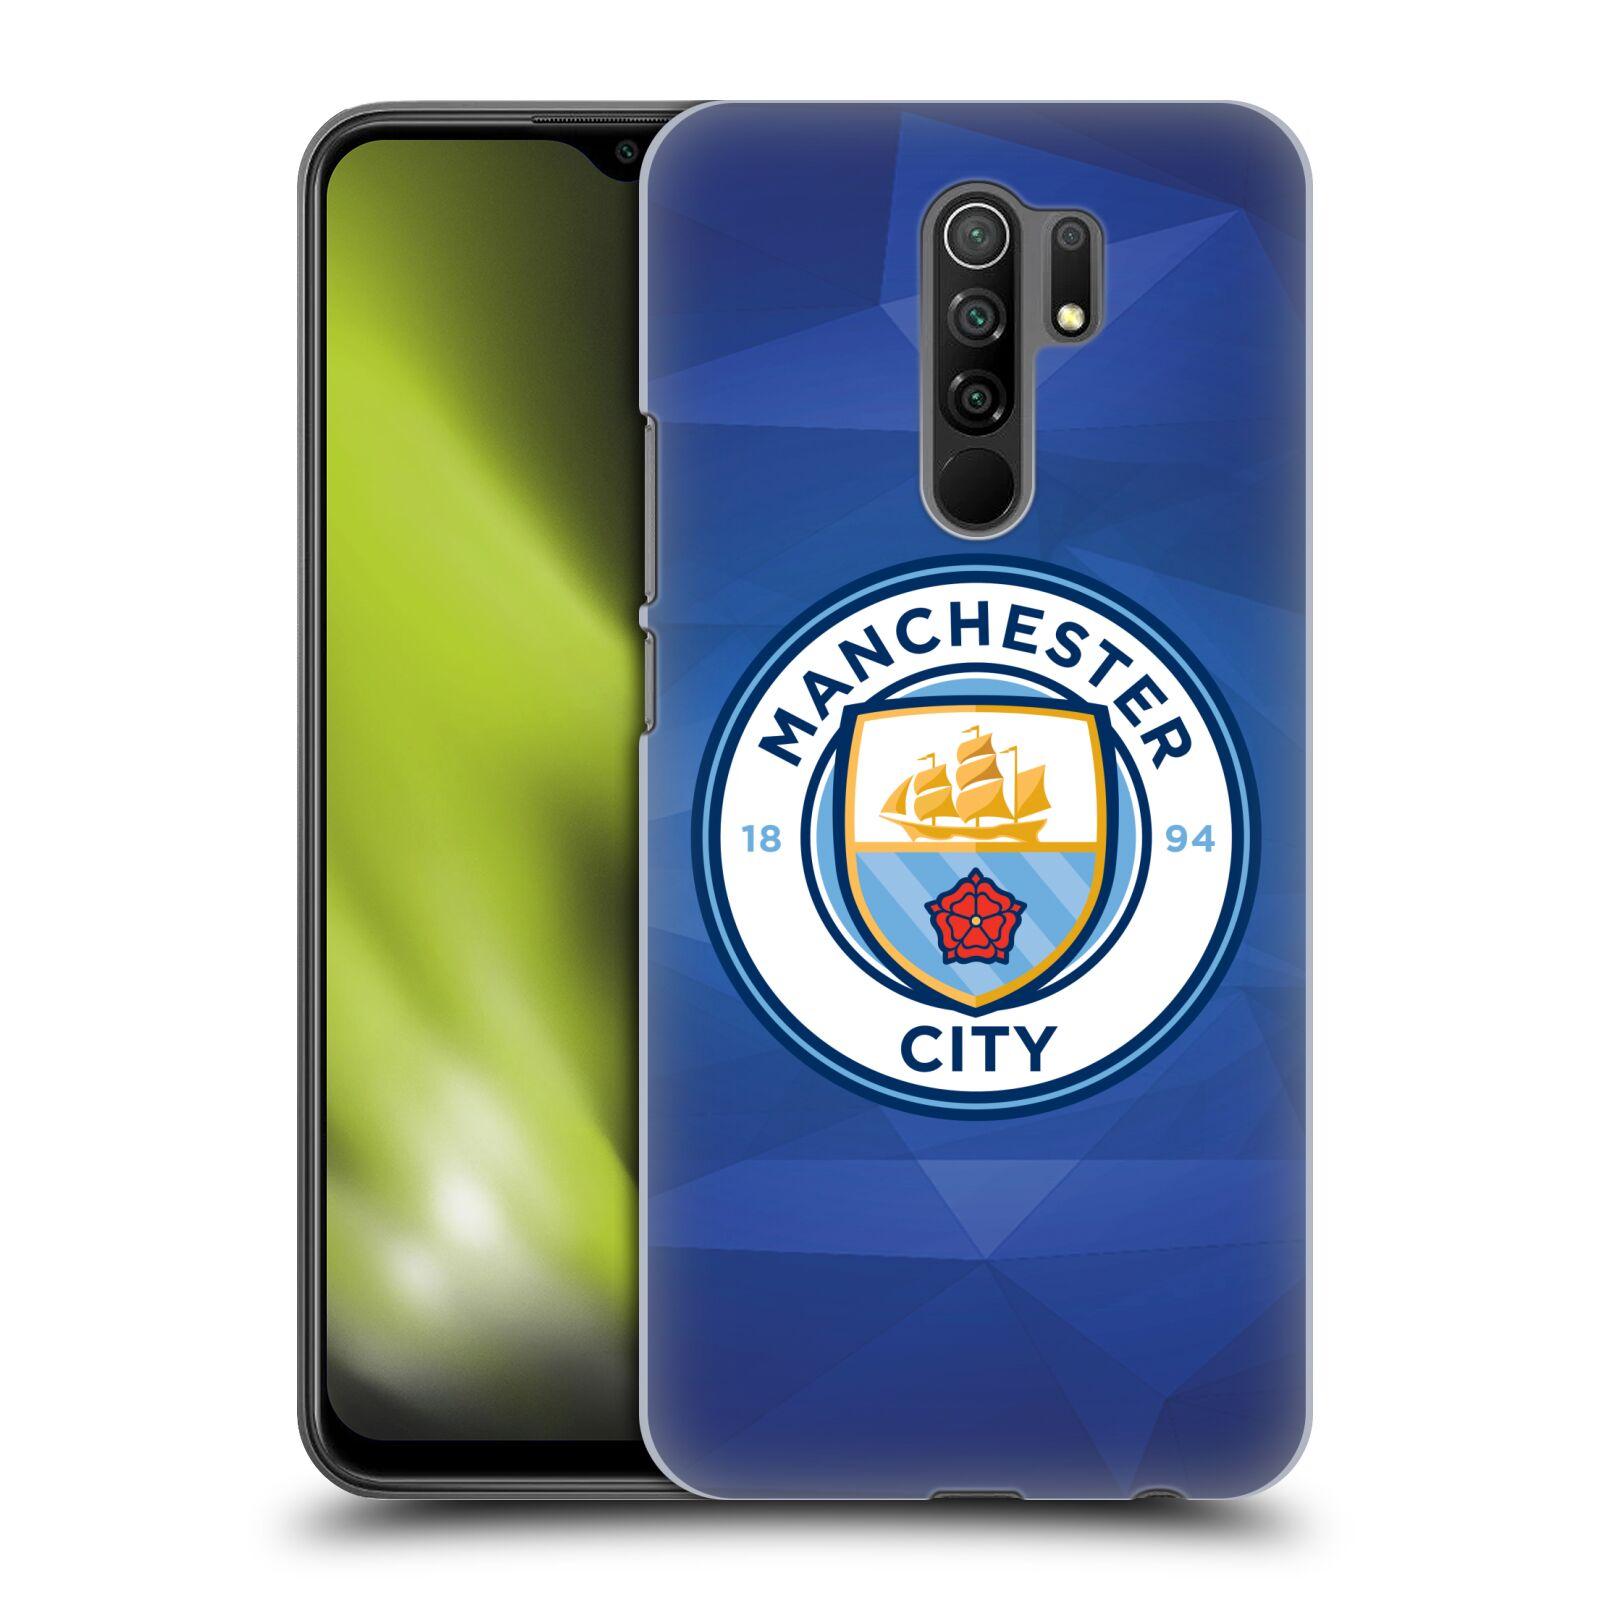 Plastové pouzdro na mobil Xiaomi Redmi 9 - Head Case - Manchester City FC - Modré nové logo